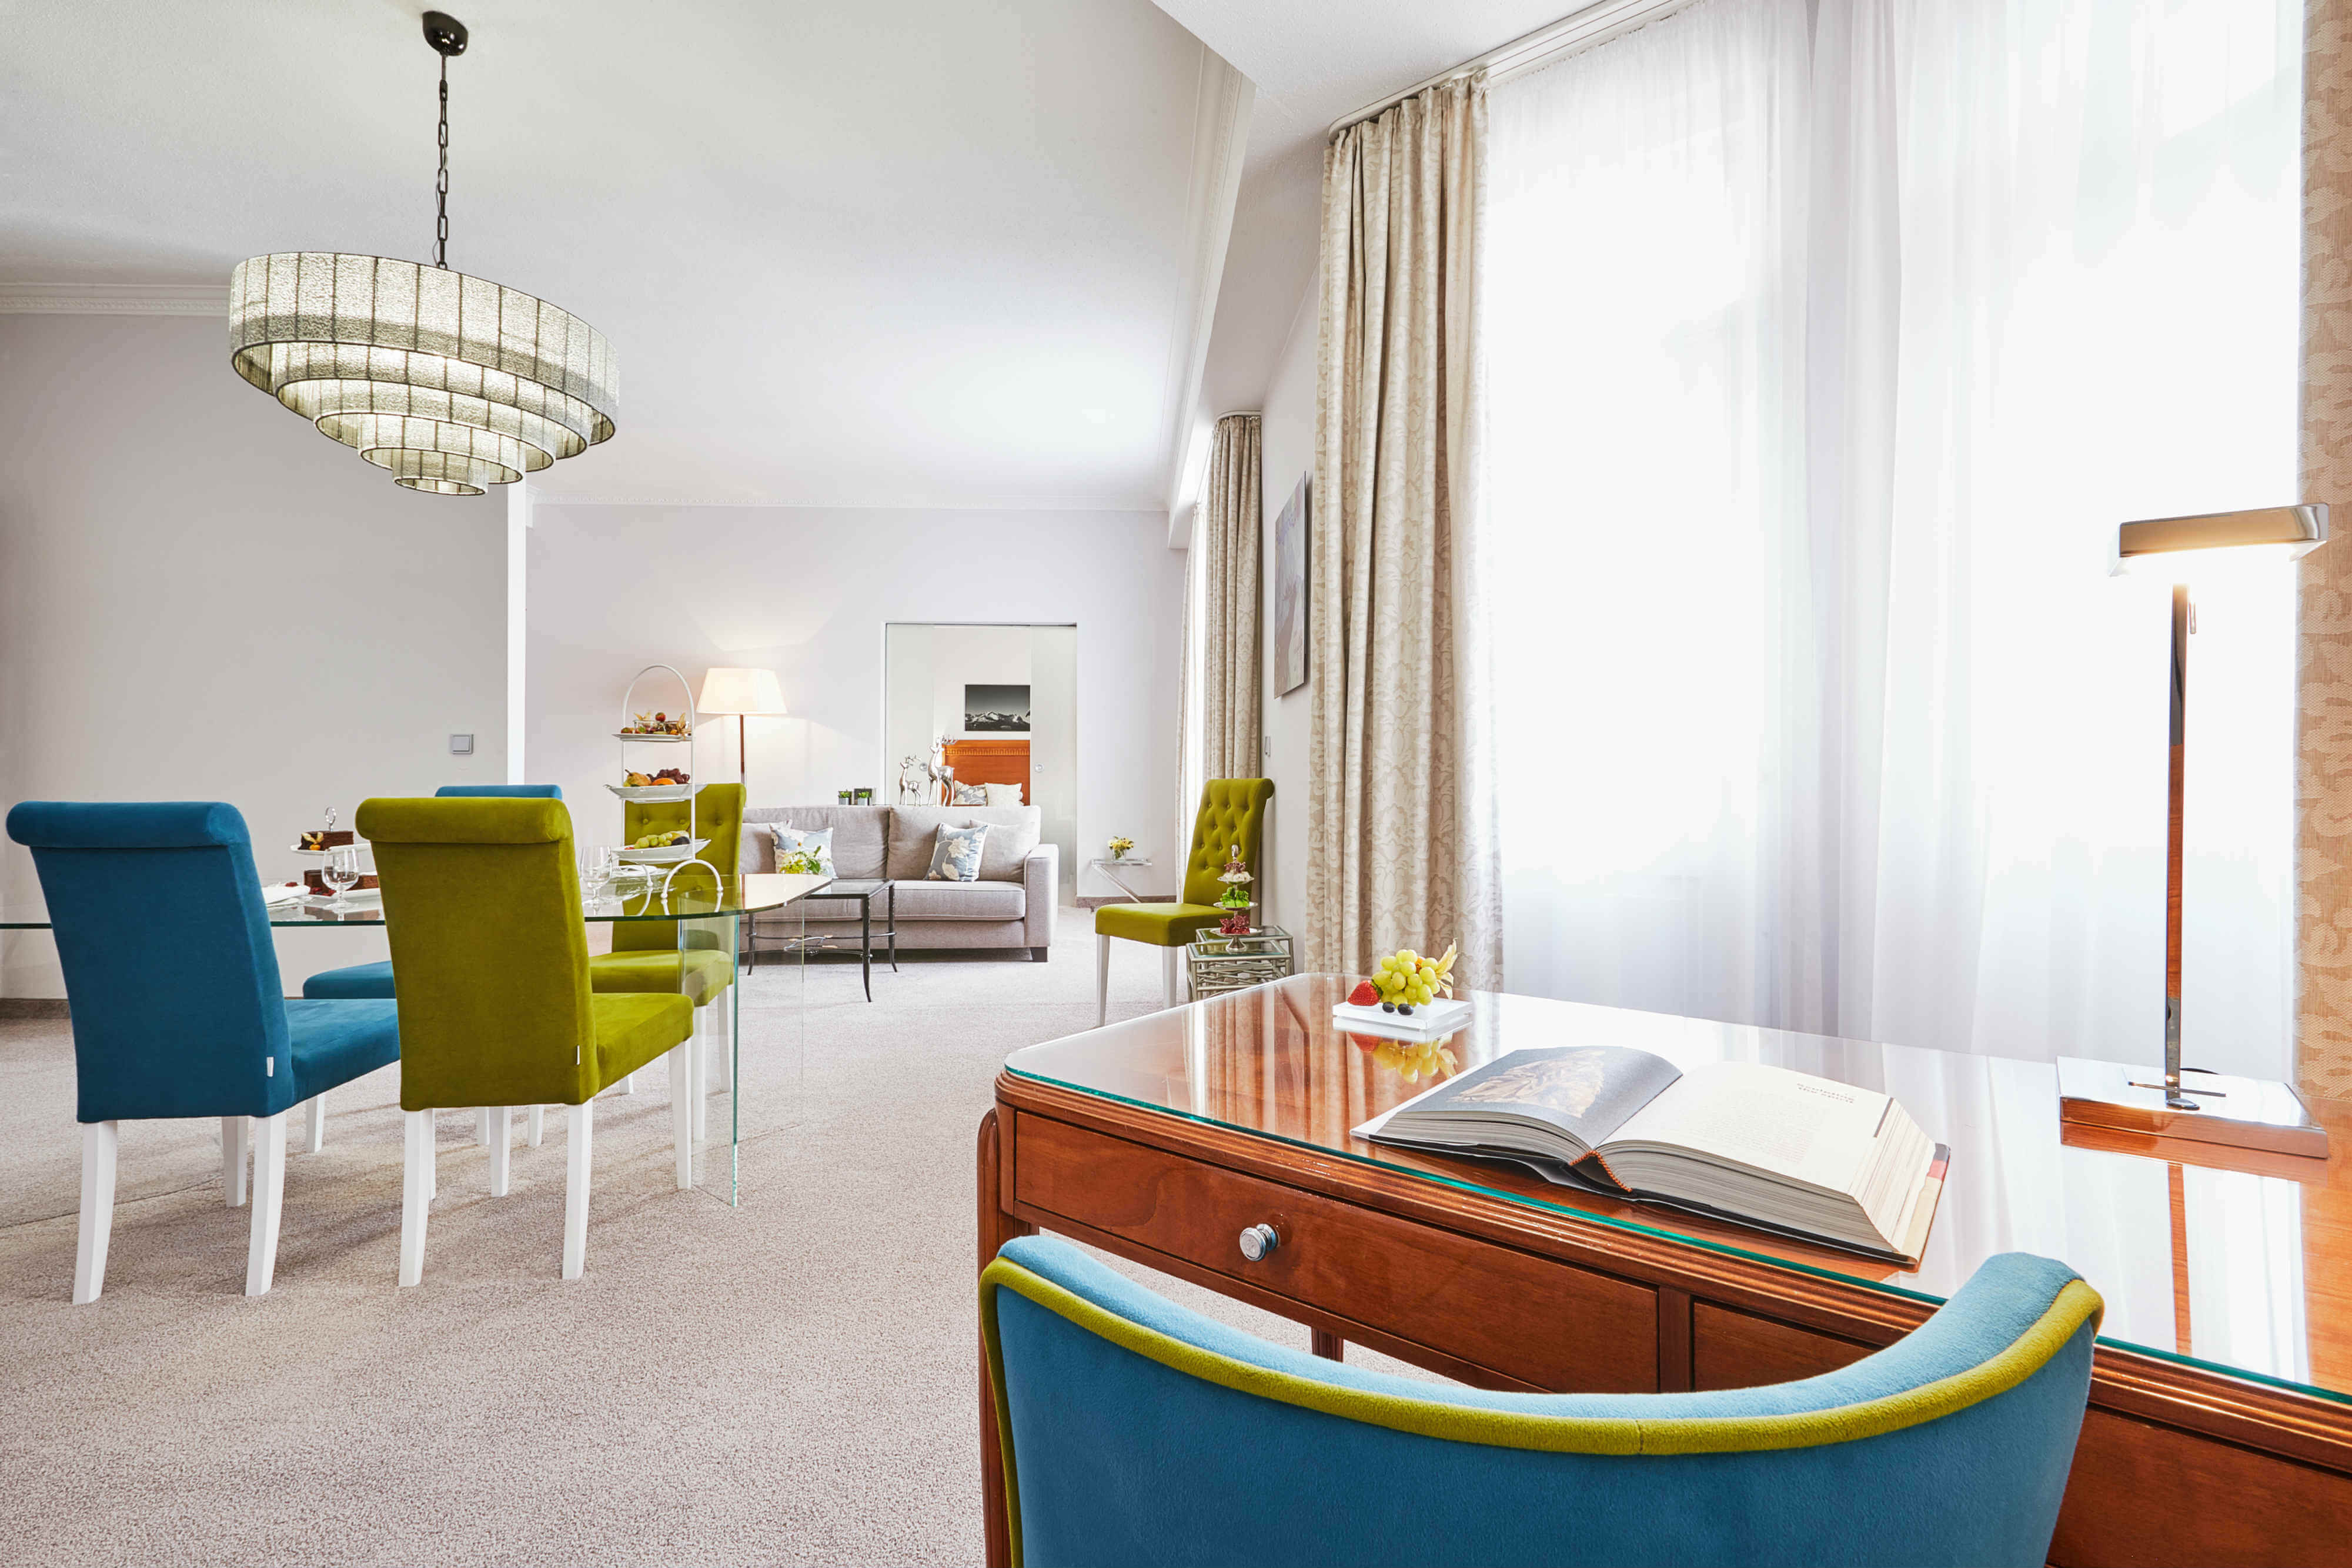 Alps Hotel Bavaria Room Garmisch